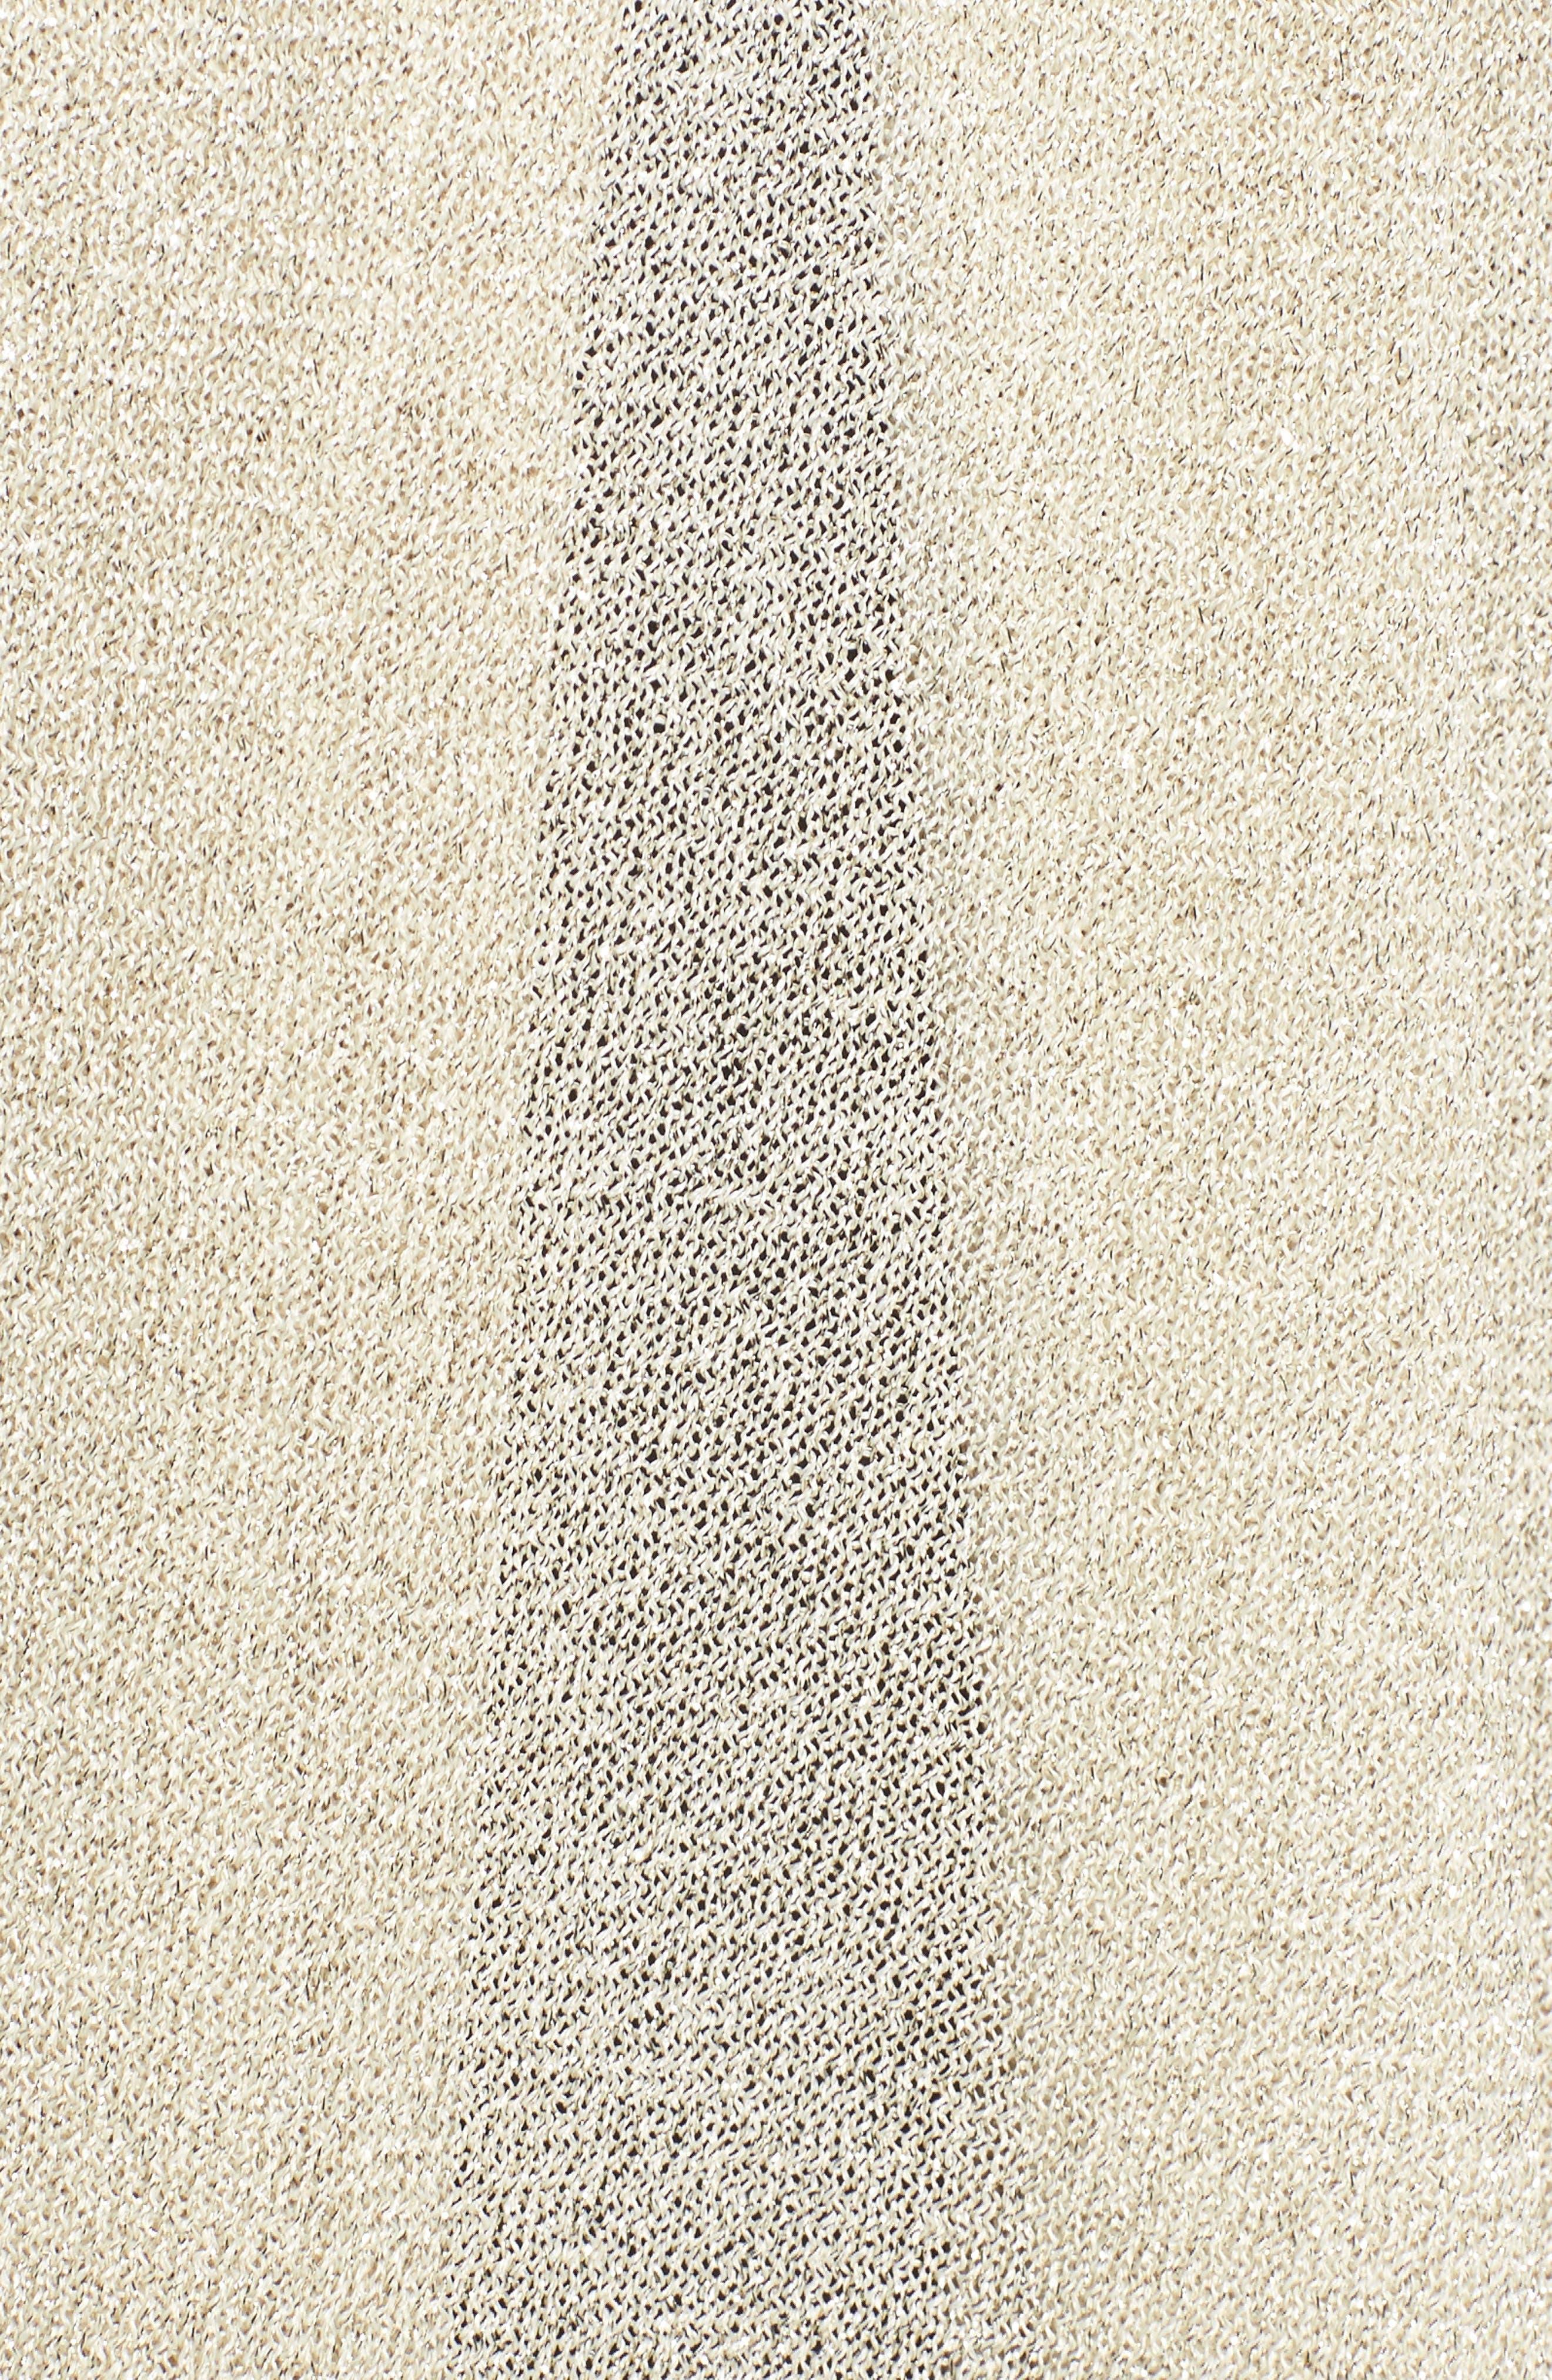 Metallic Knit Wrap,                             Alternate thumbnail 5, color,                             710